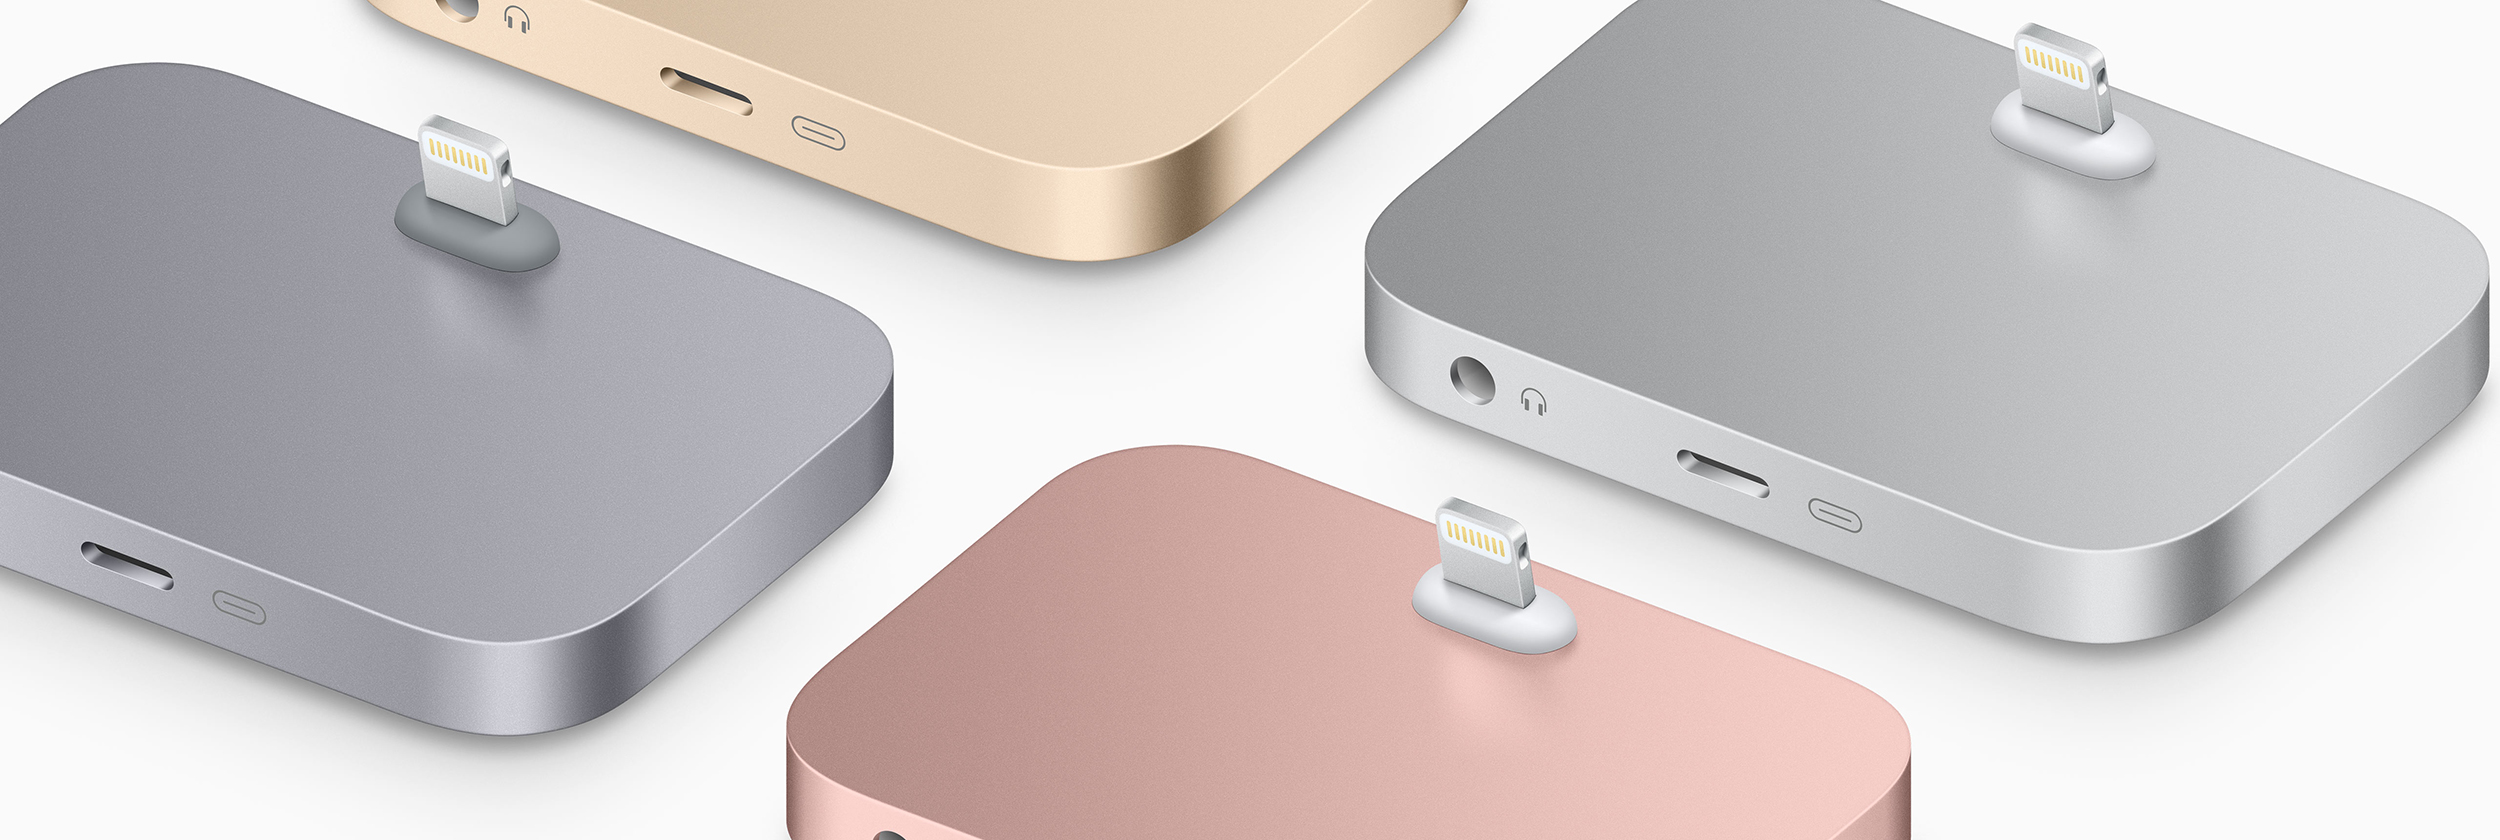 apple-iphone-6s-metal-aluminum-dock-colors.jpg